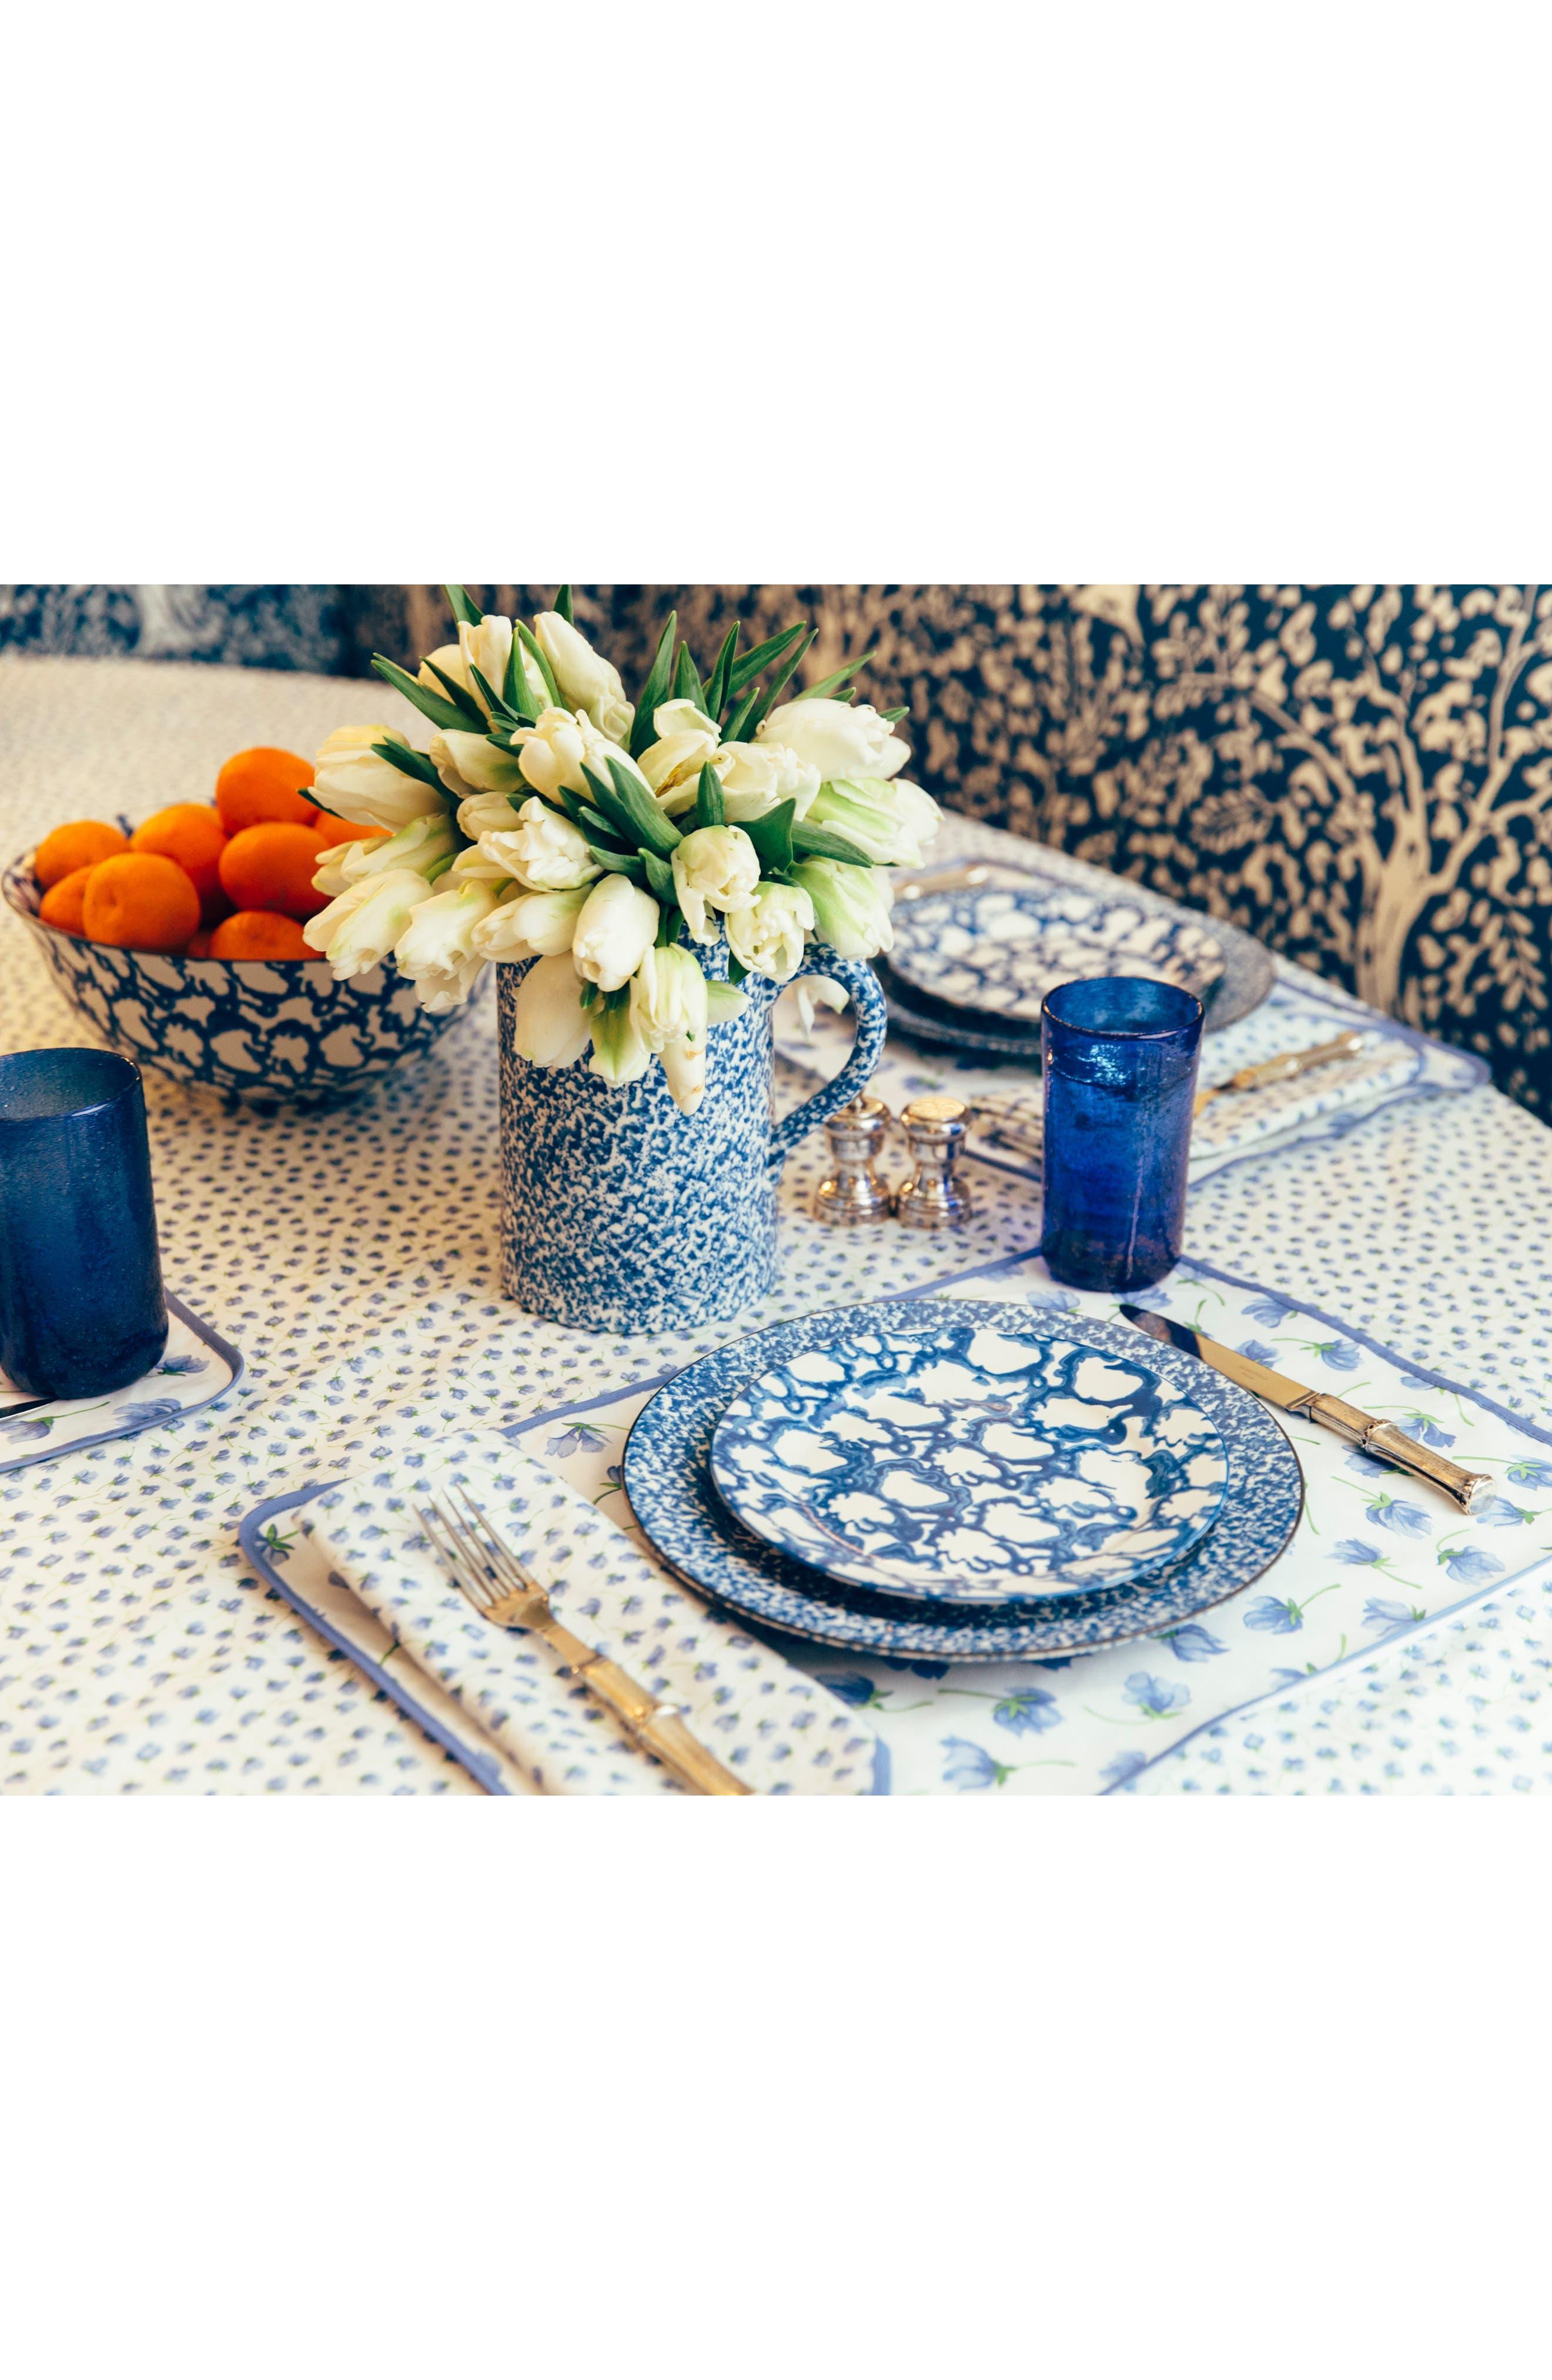 TORY BURCH,                             Set of 2 Spongeware Dinner Plates,                             Alternate thumbnail 3, color,                             CLASSIC SPONGE